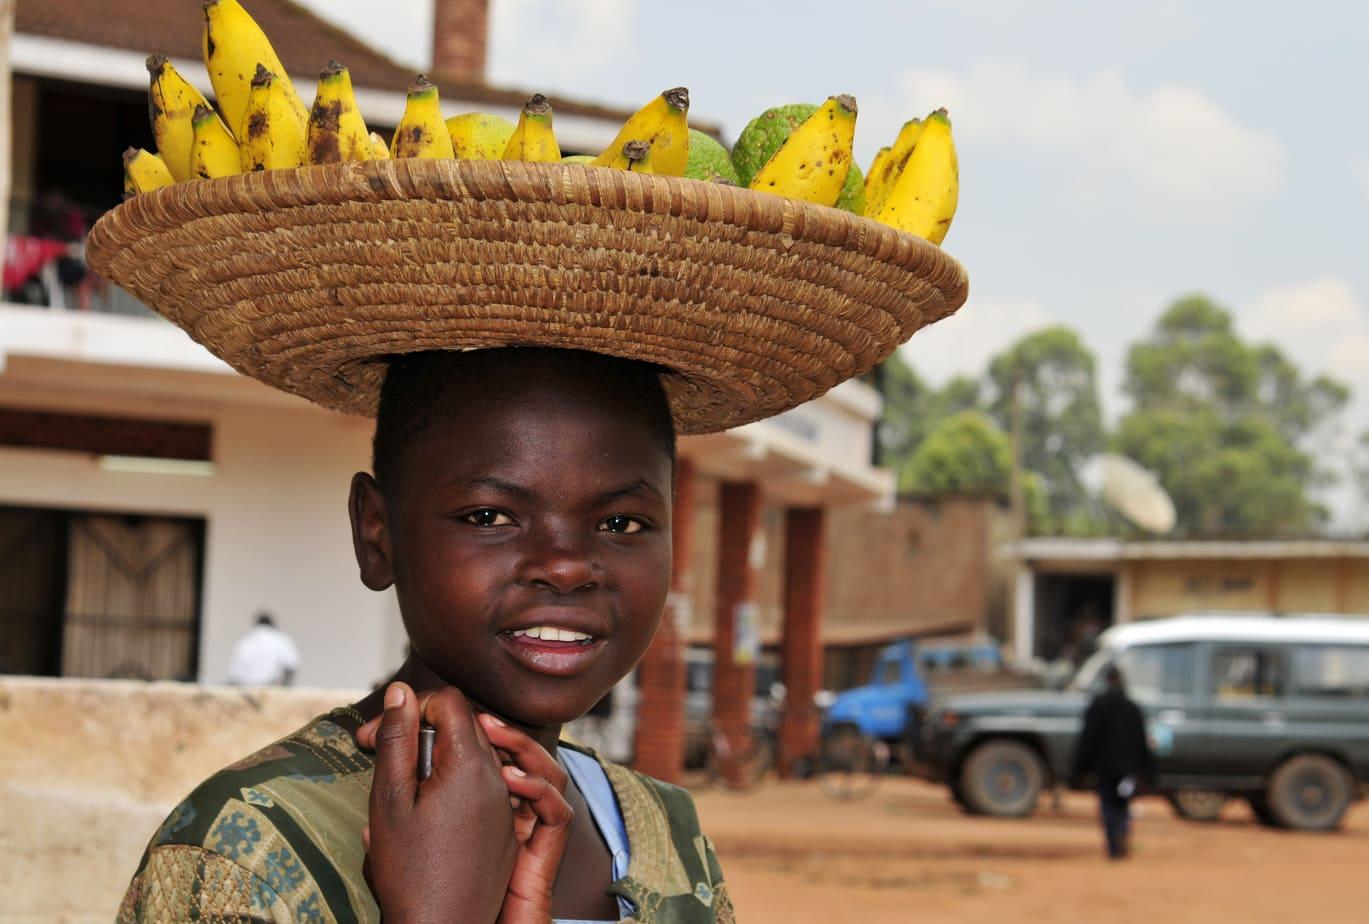 Ugandan boy selling bananas